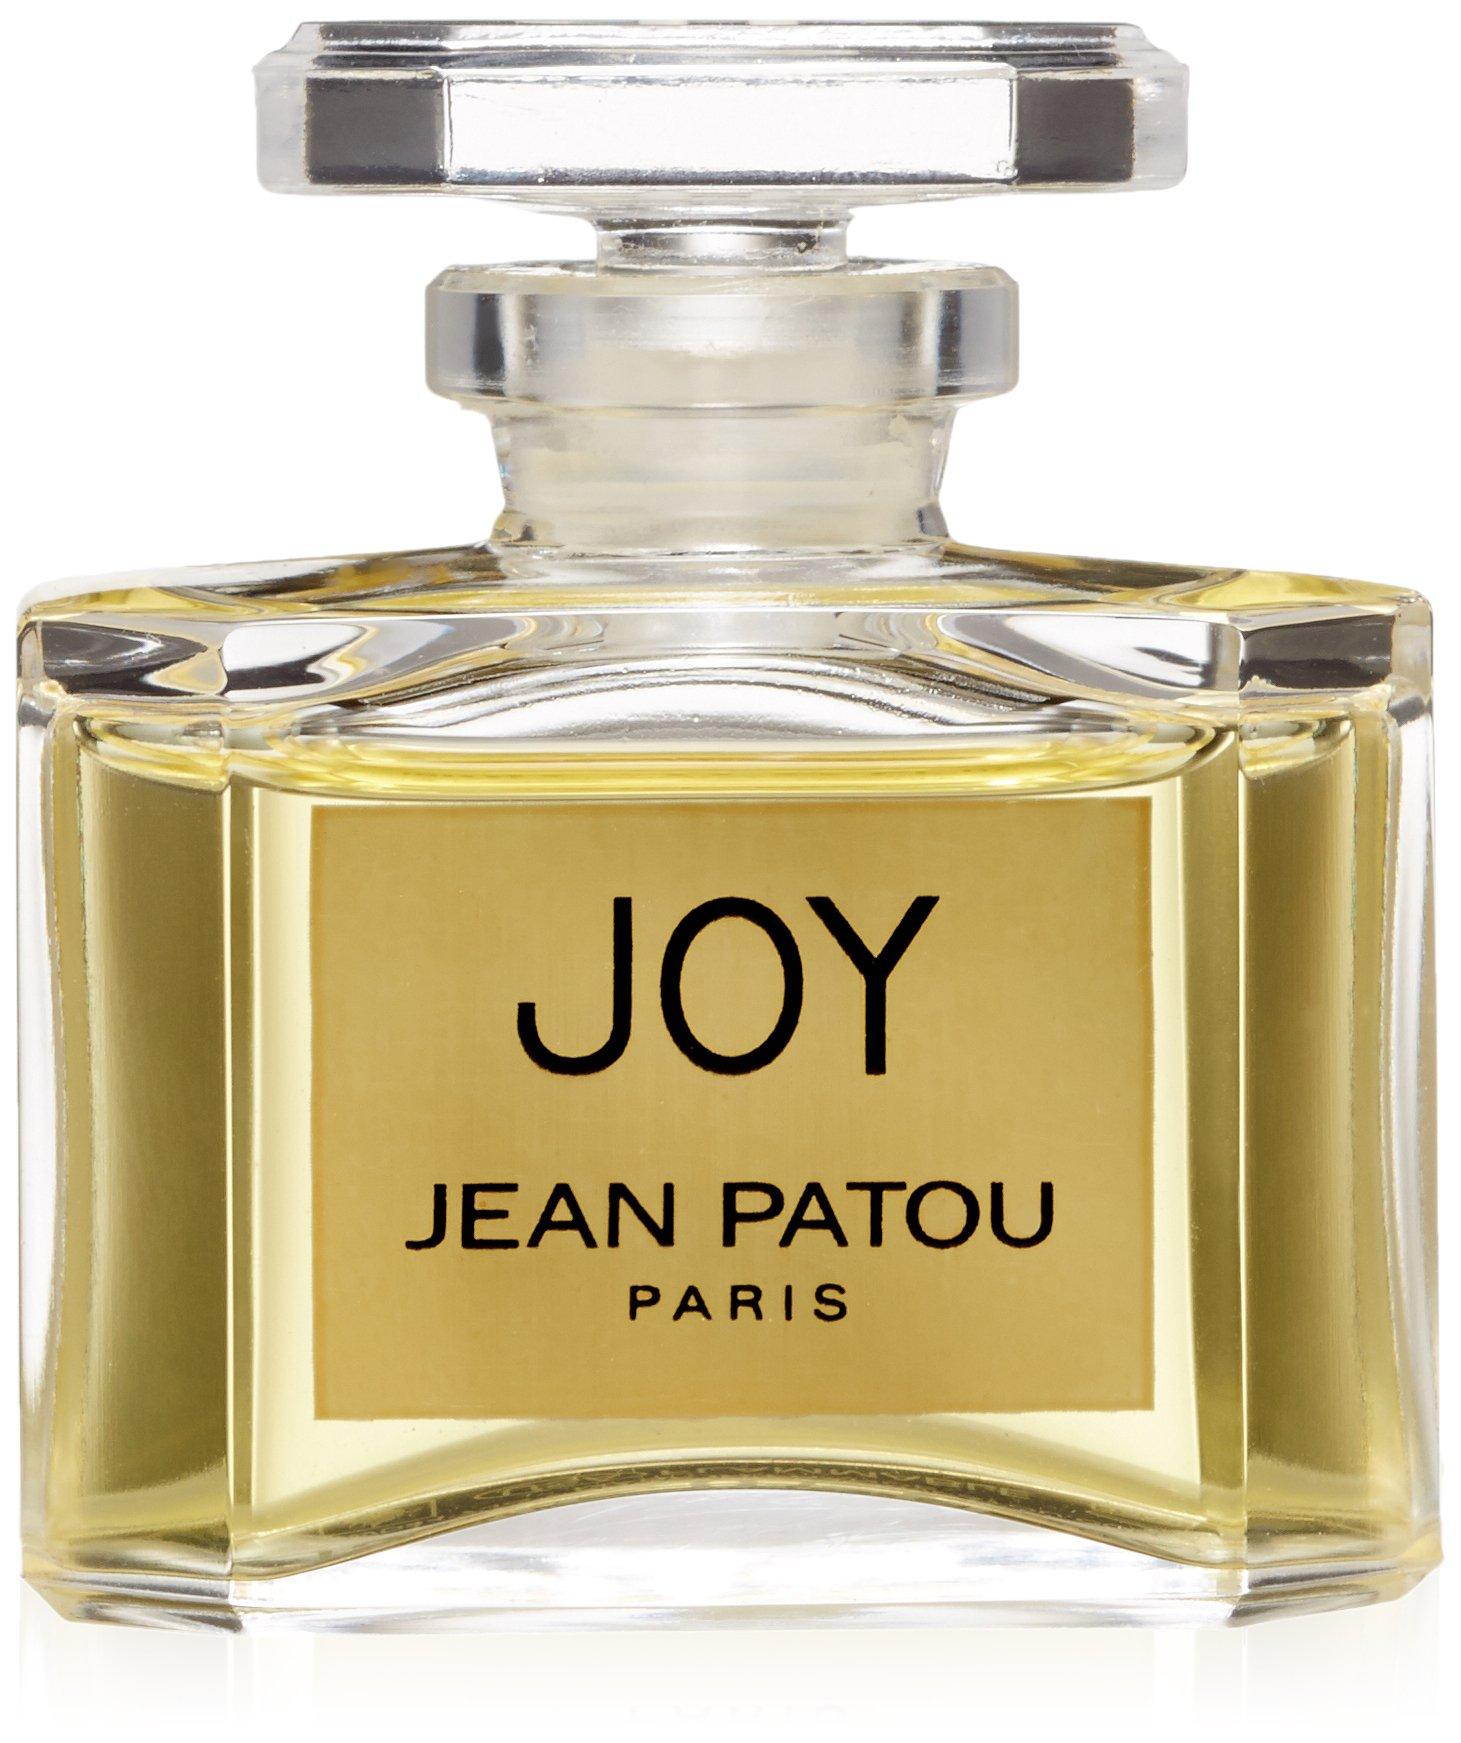 Jean Patou Joy Parfum Flacon Luxe, 0.5 fl.oz.